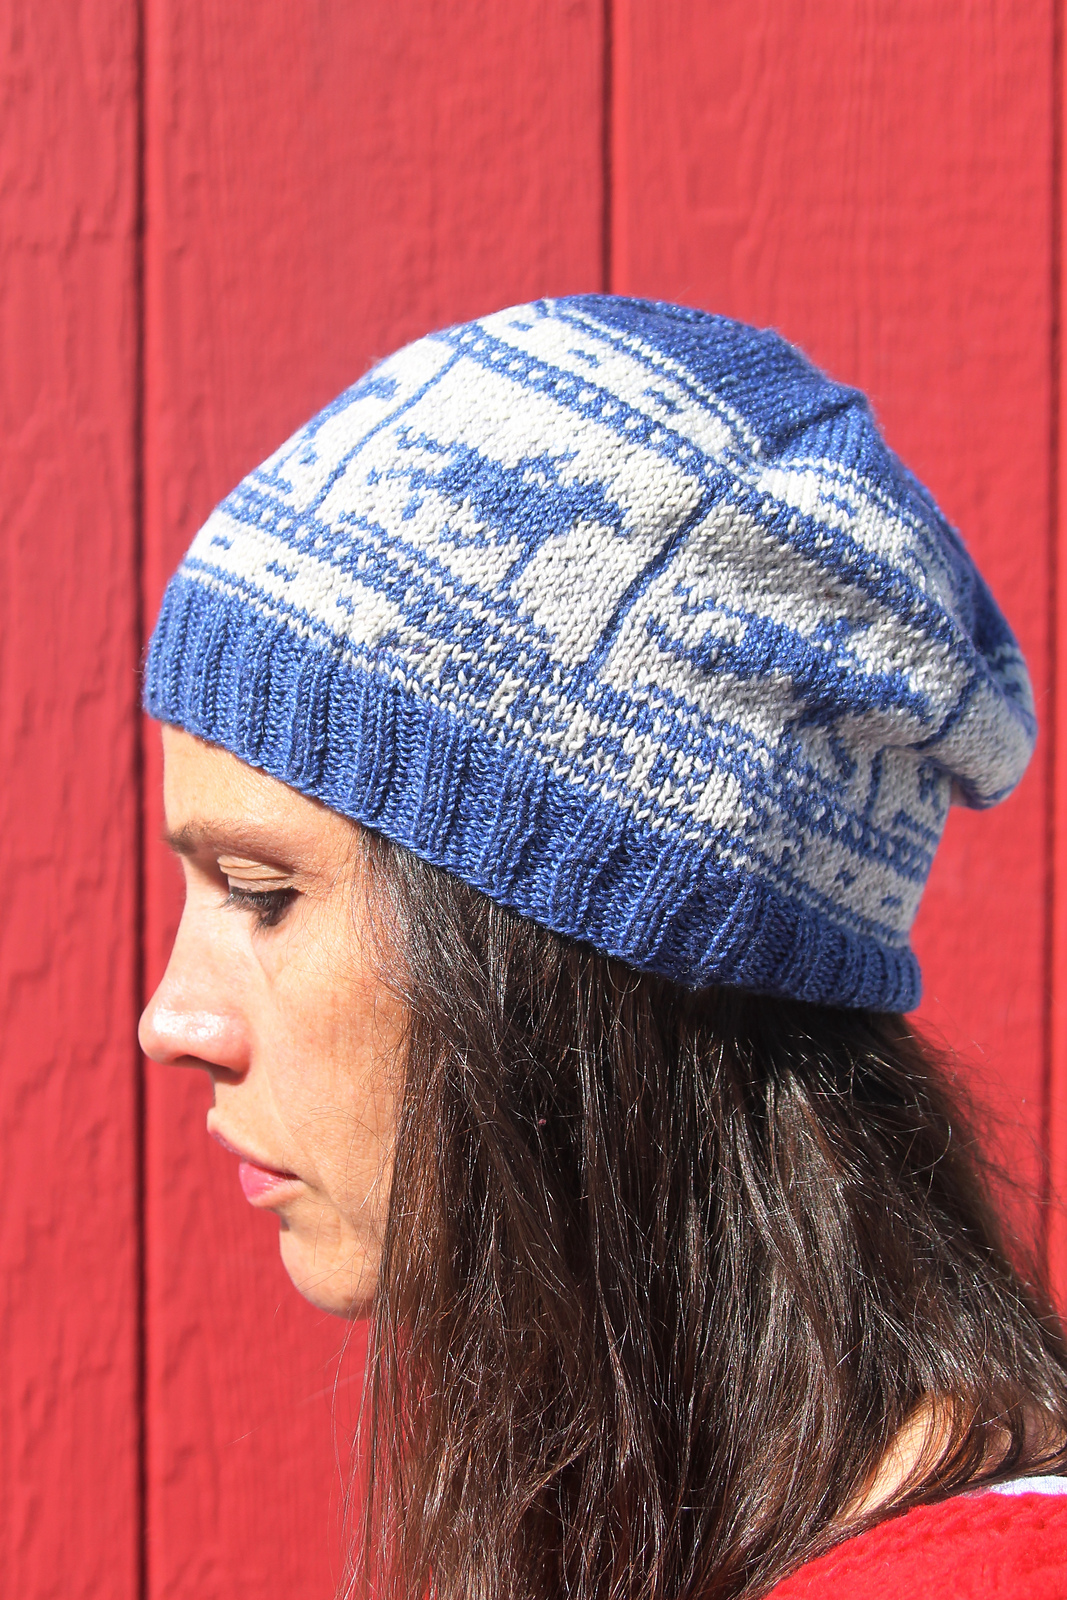 Zoetrope, knit by Stacy (shutterhoney)